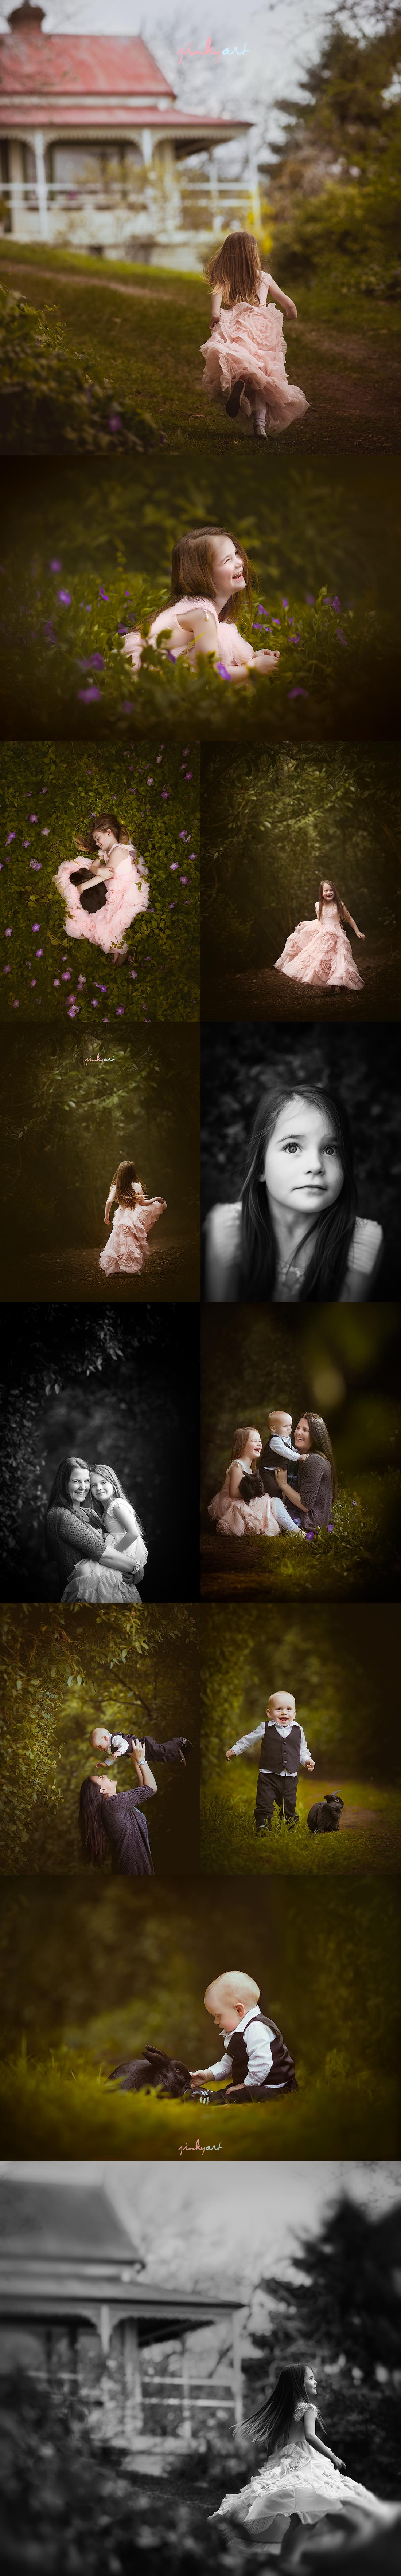 jinkyart family photography session 13413